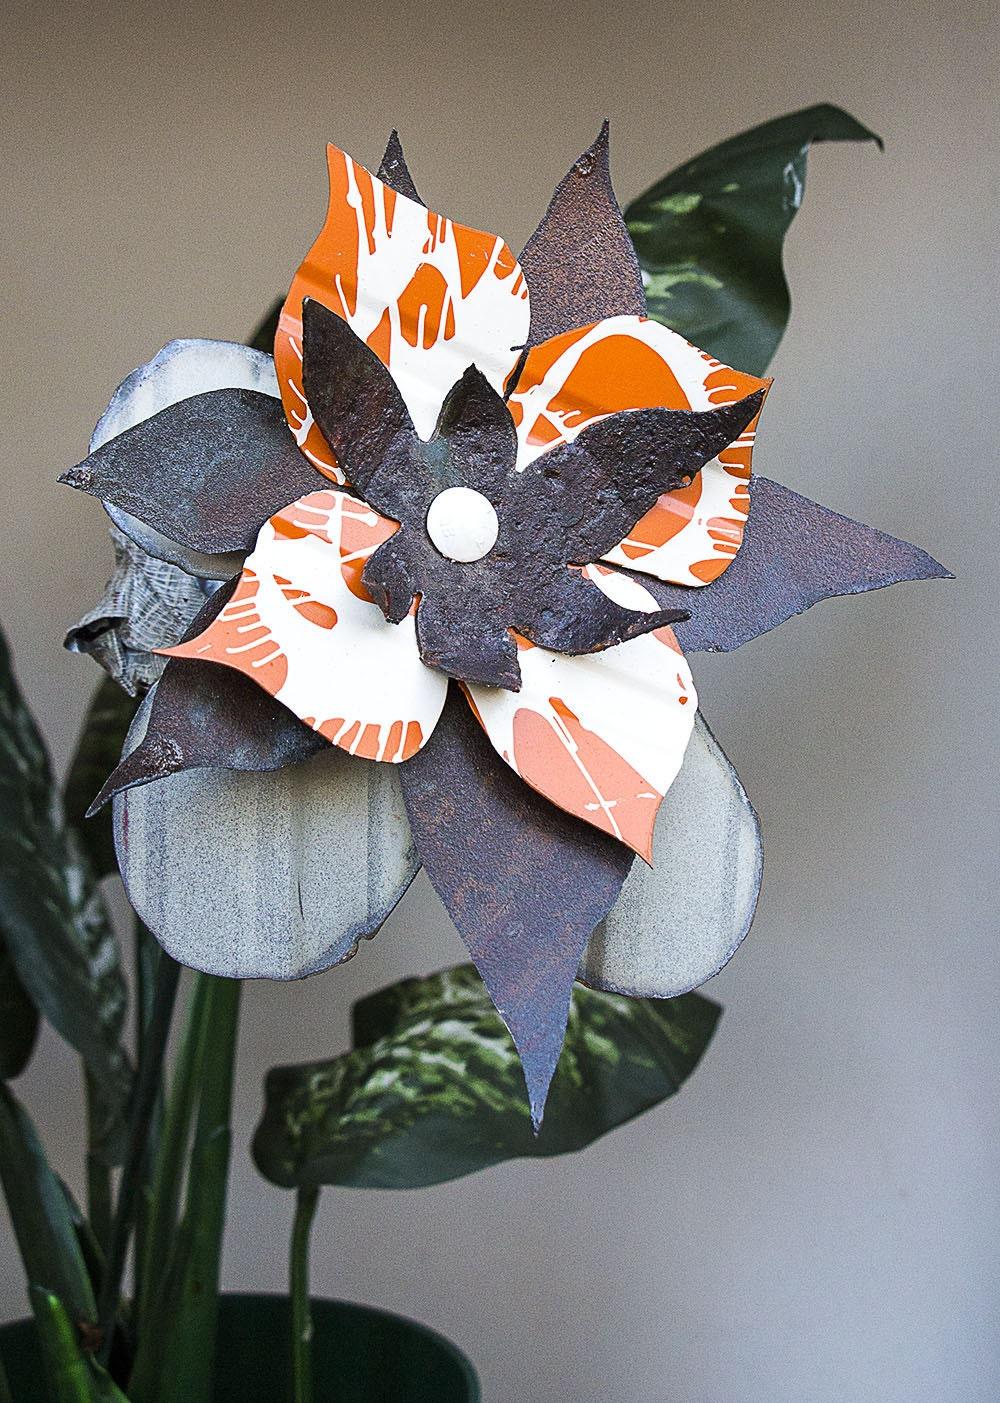 white orange rust raw metal yard art flower indoor outdoor. Black Bedroom Furniture Sets. Home Design Ideas